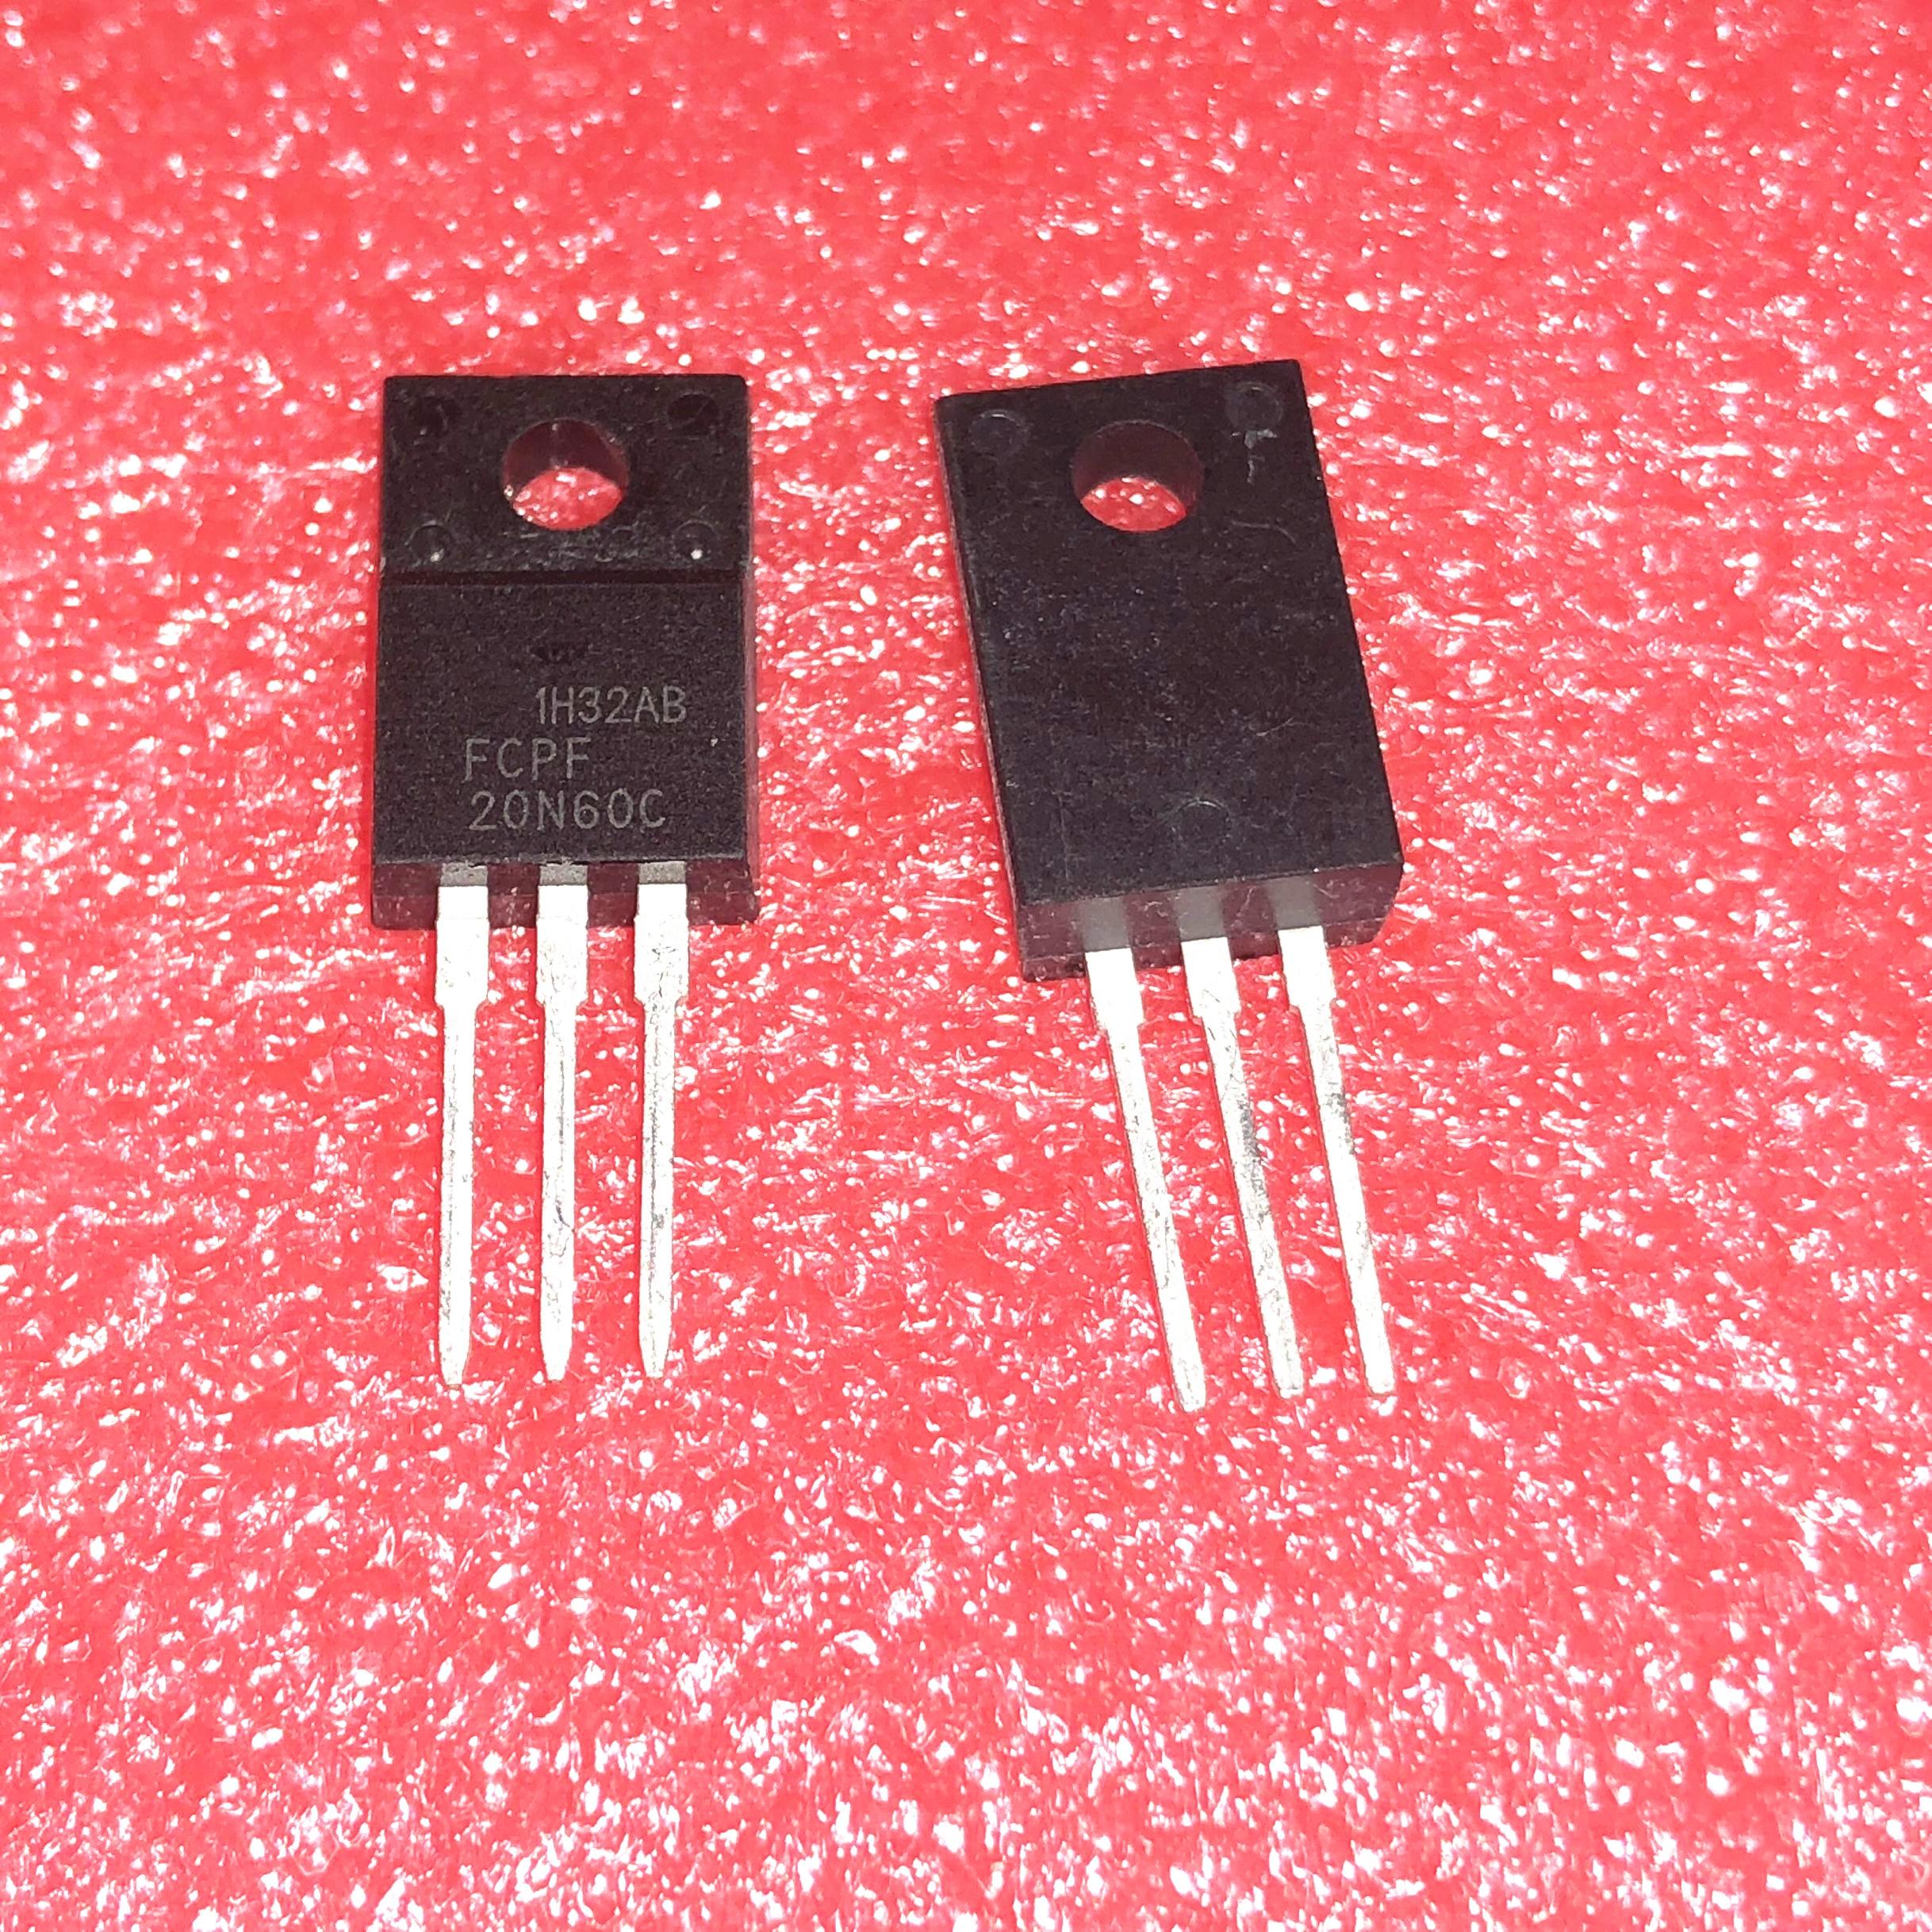 10pcs/lot FCPF20N60 FCPF20N60C  20N60C3 P20NM60FP 20N60 TO-220F In Stock